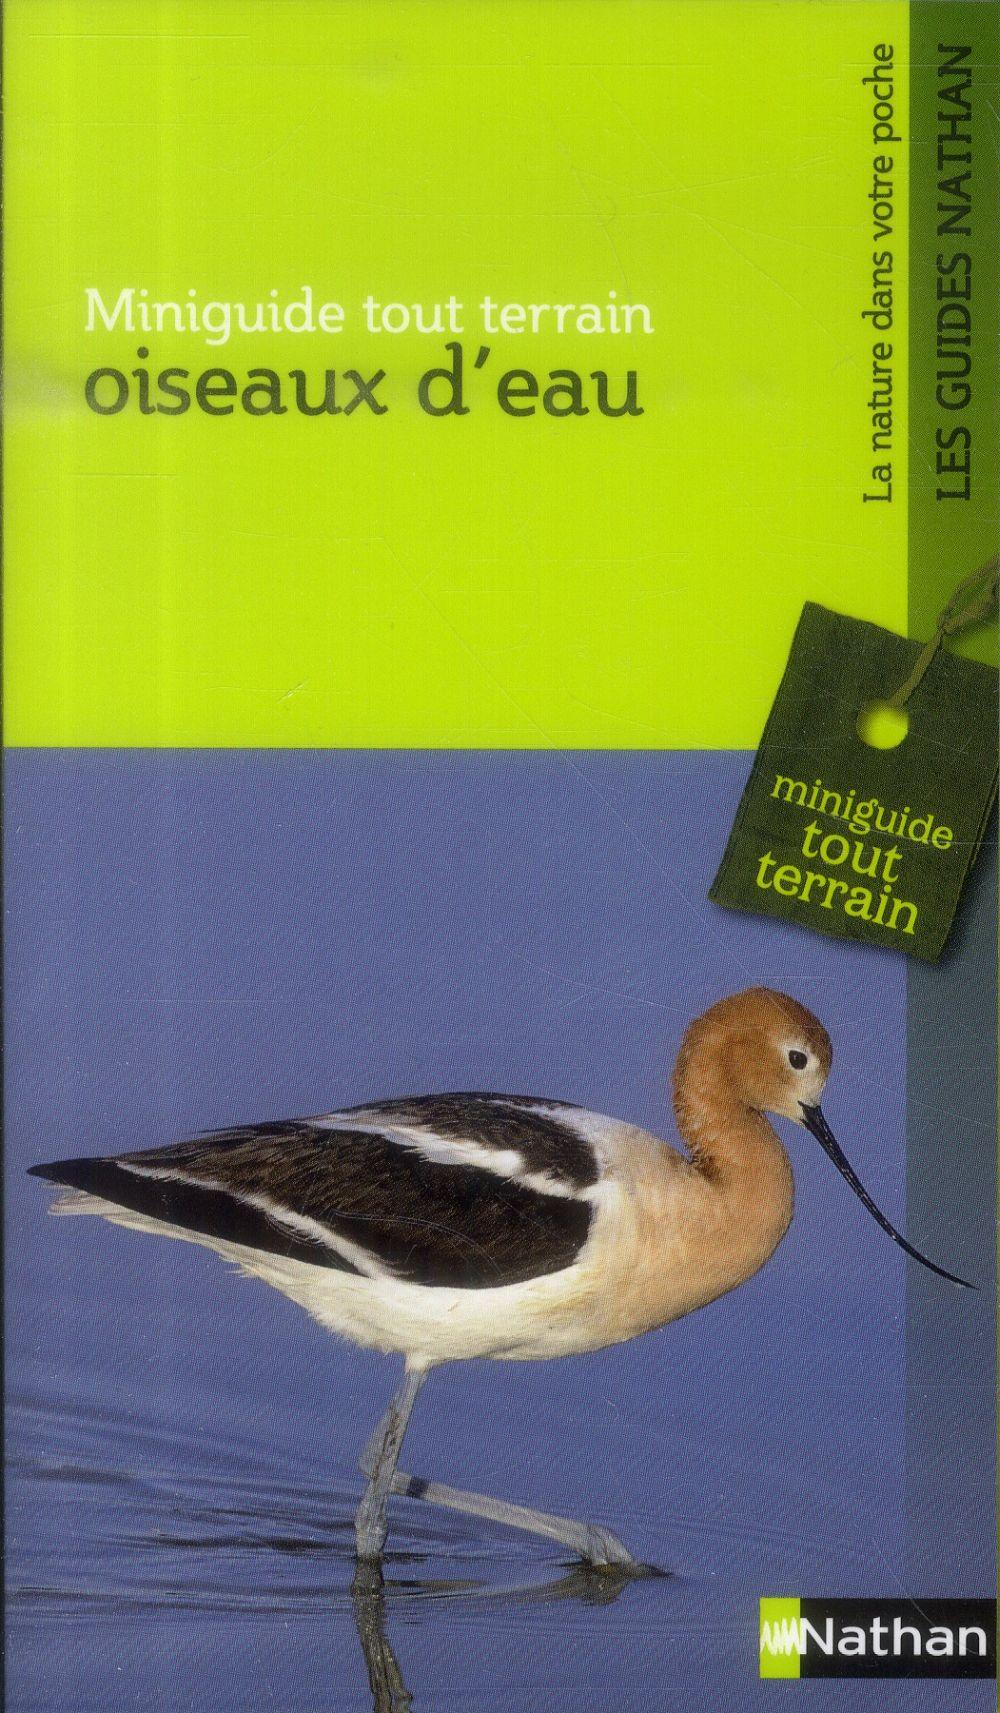 OISEAUX D'EAU MINIGUIDE TT